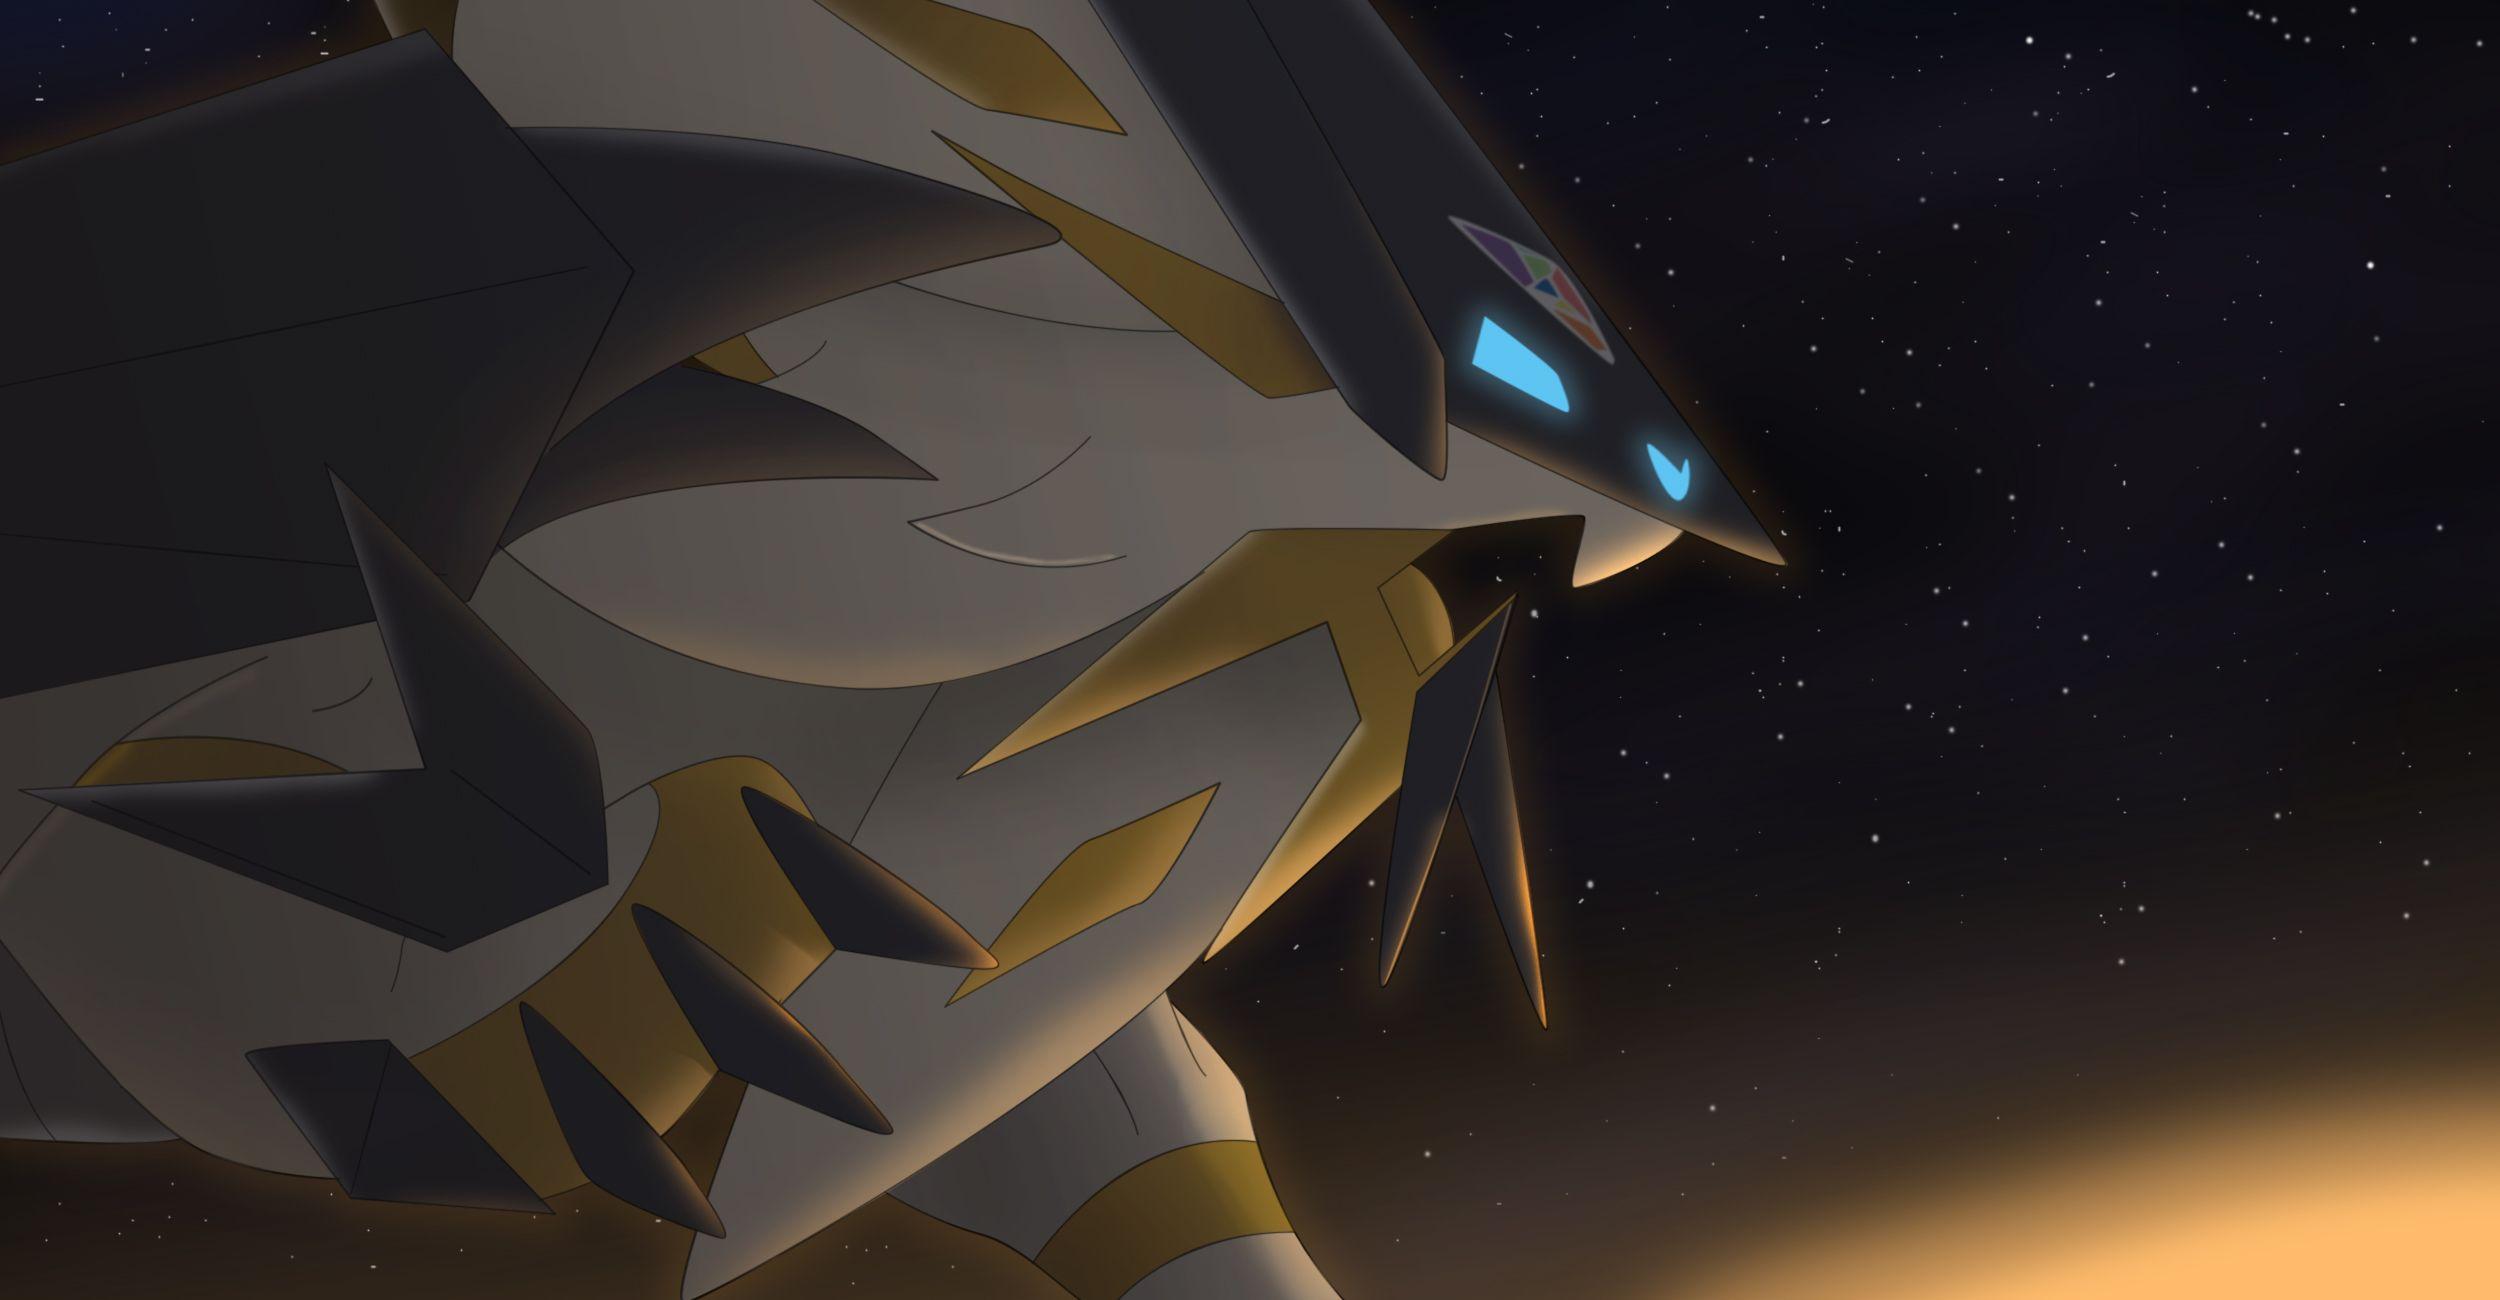 Pokemon Ultra Sun and Moon Wallpapers   Top Pokemon Ultra Sun 2500x1300